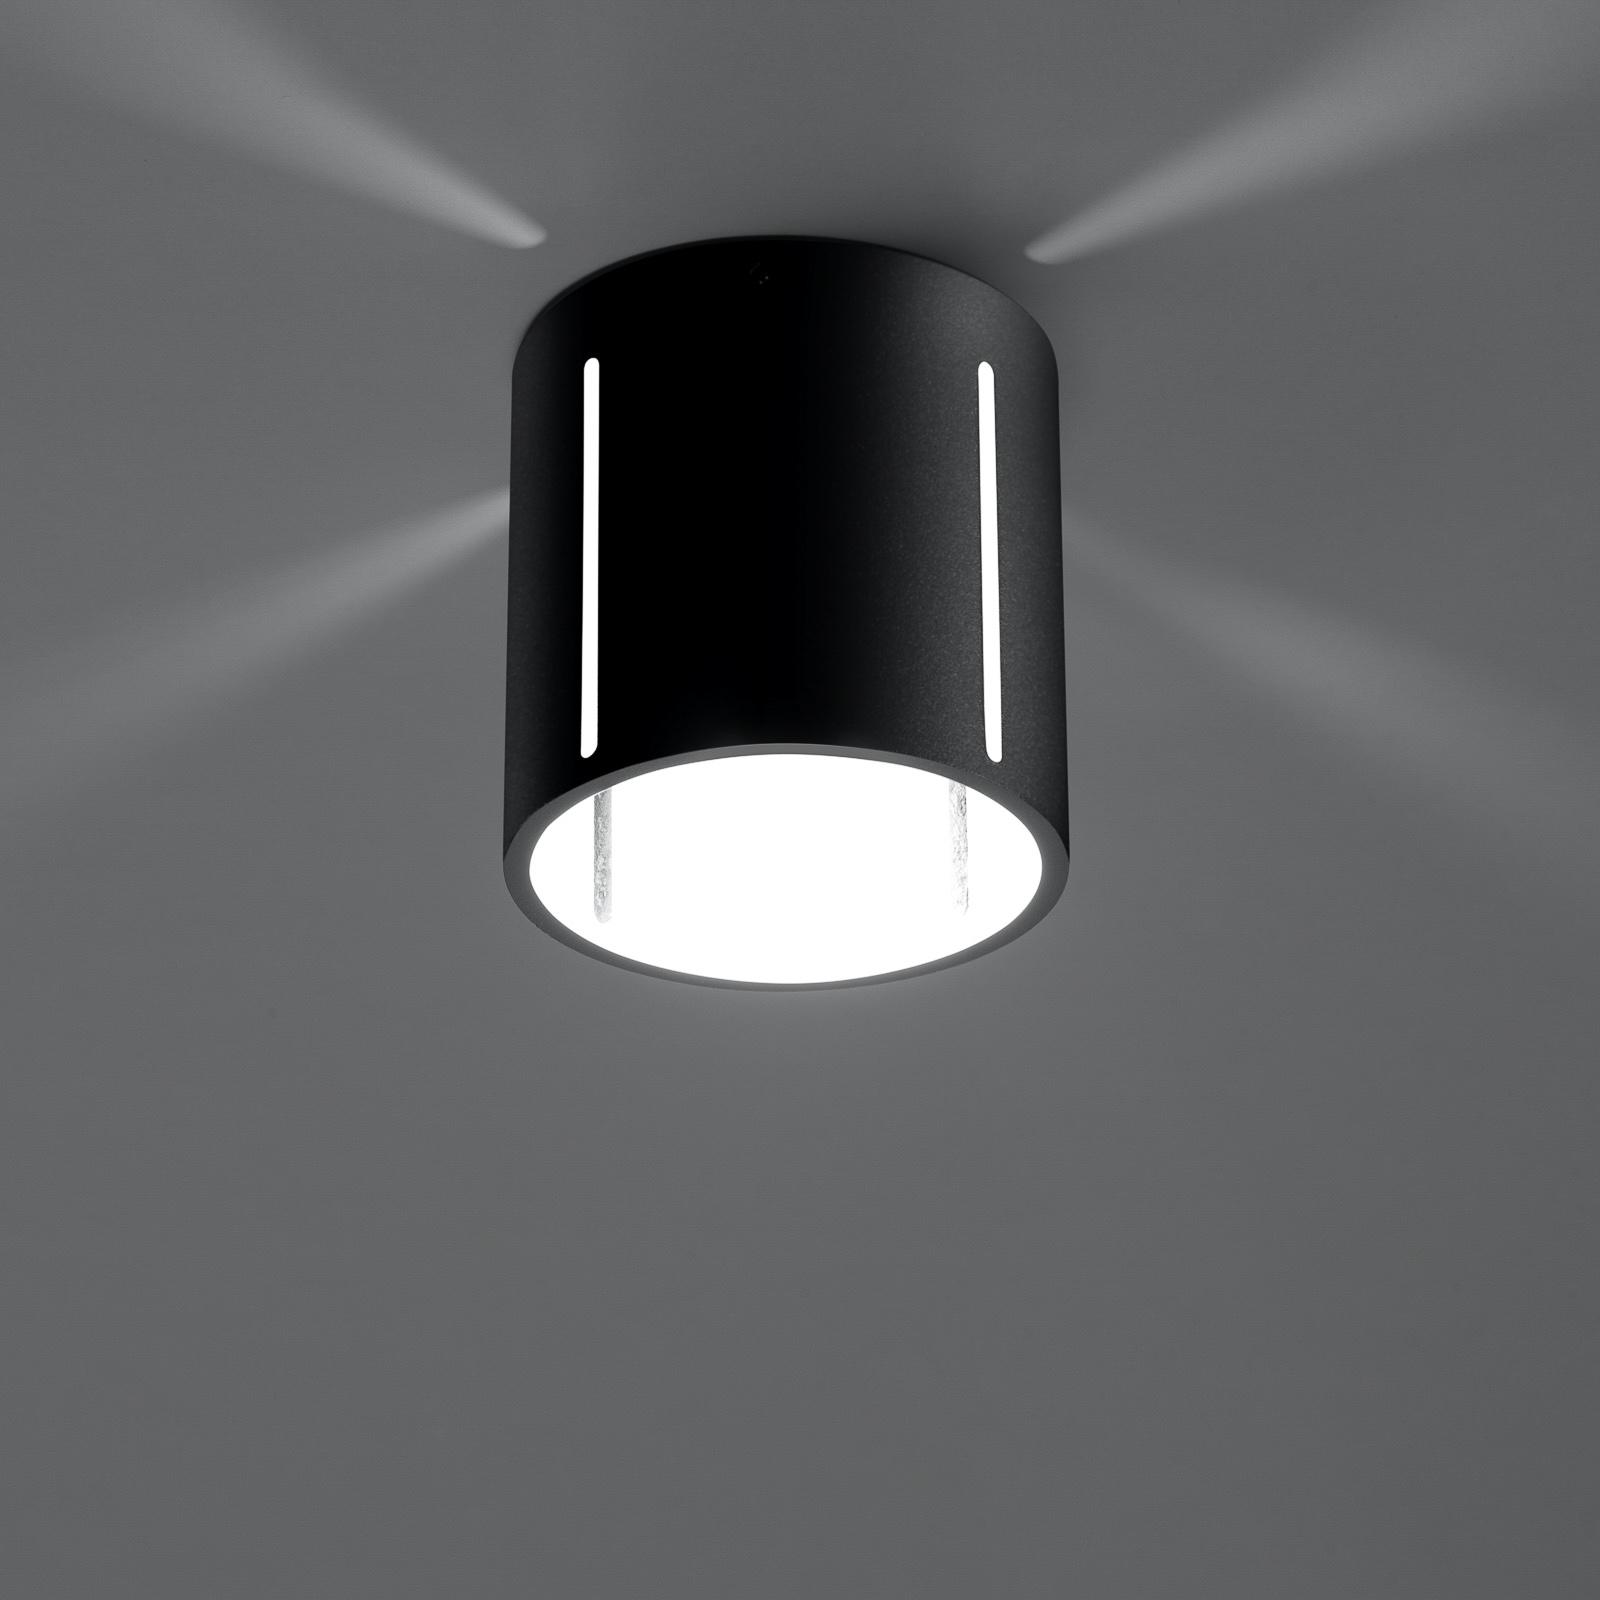 Lampa sufitowa Topa jako czarny cylinder